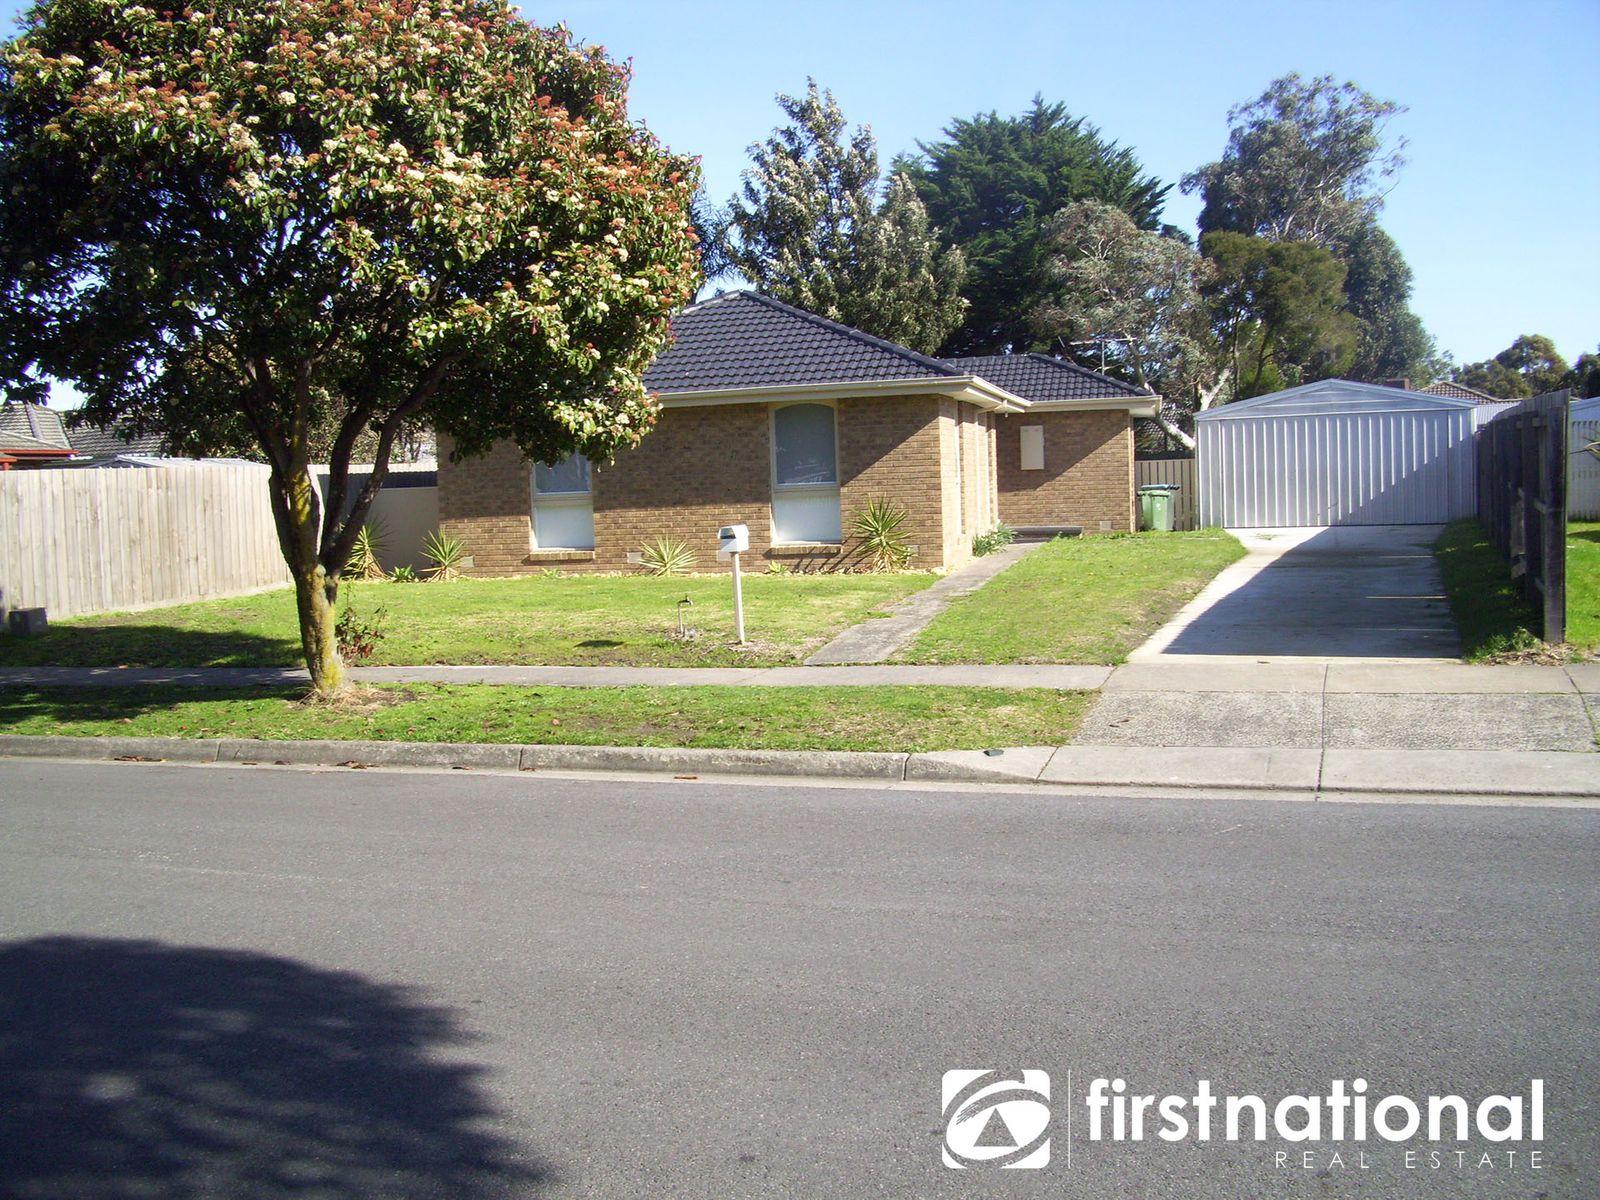 1 Fernwood Road, Narre Warren, VIC 3805